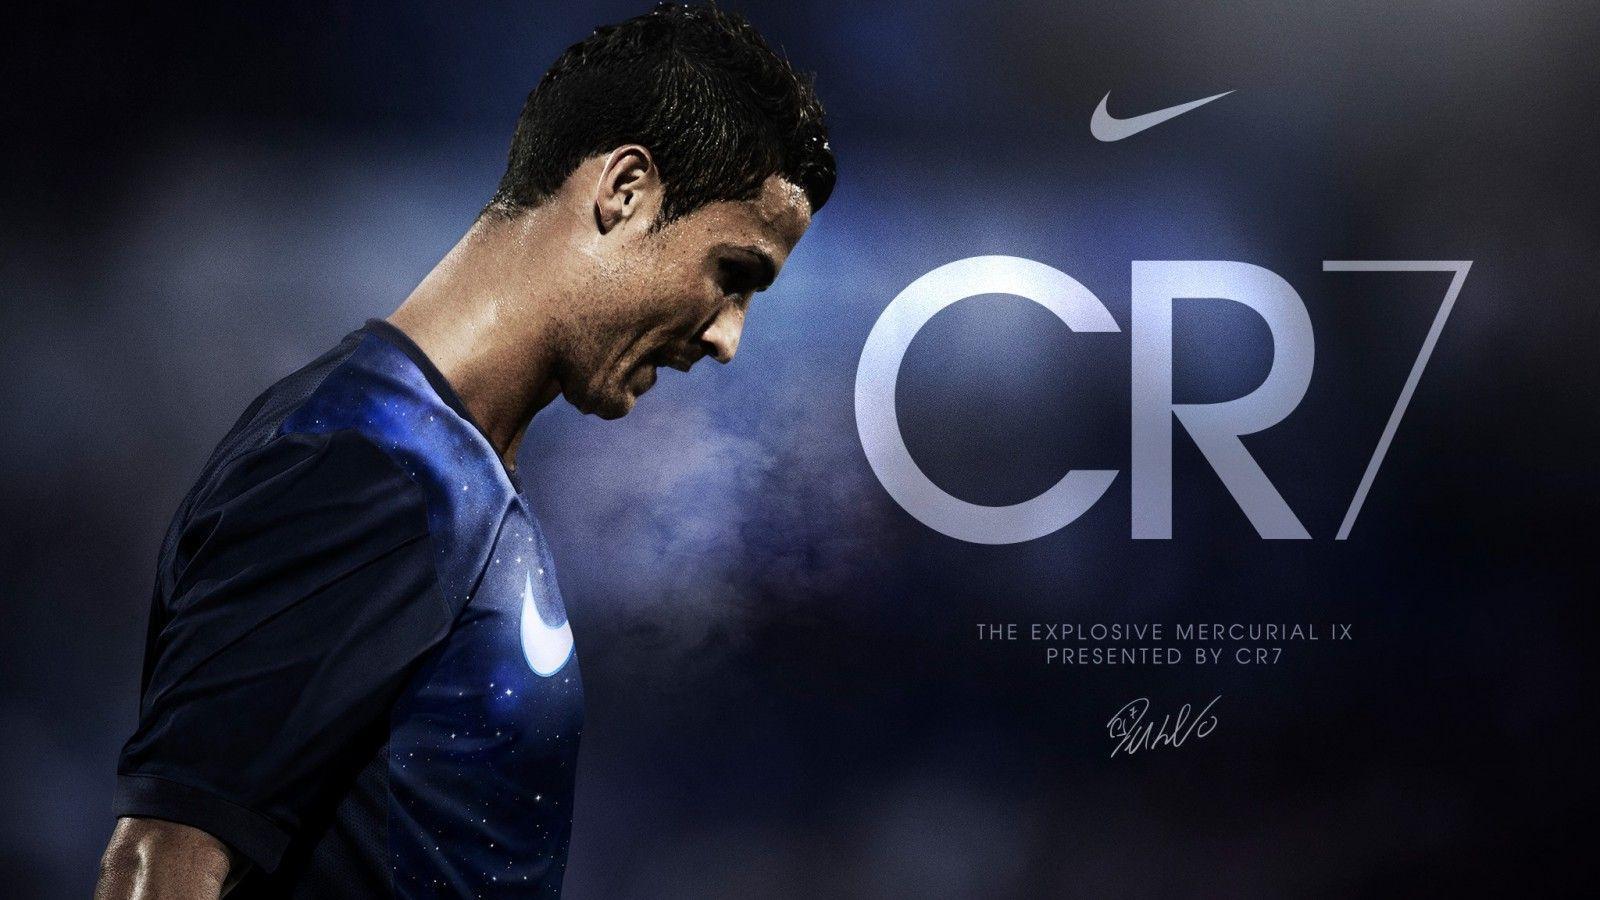 Cristiano Ronaldo Artwork Football Player HD Wallpaper #3462 ...